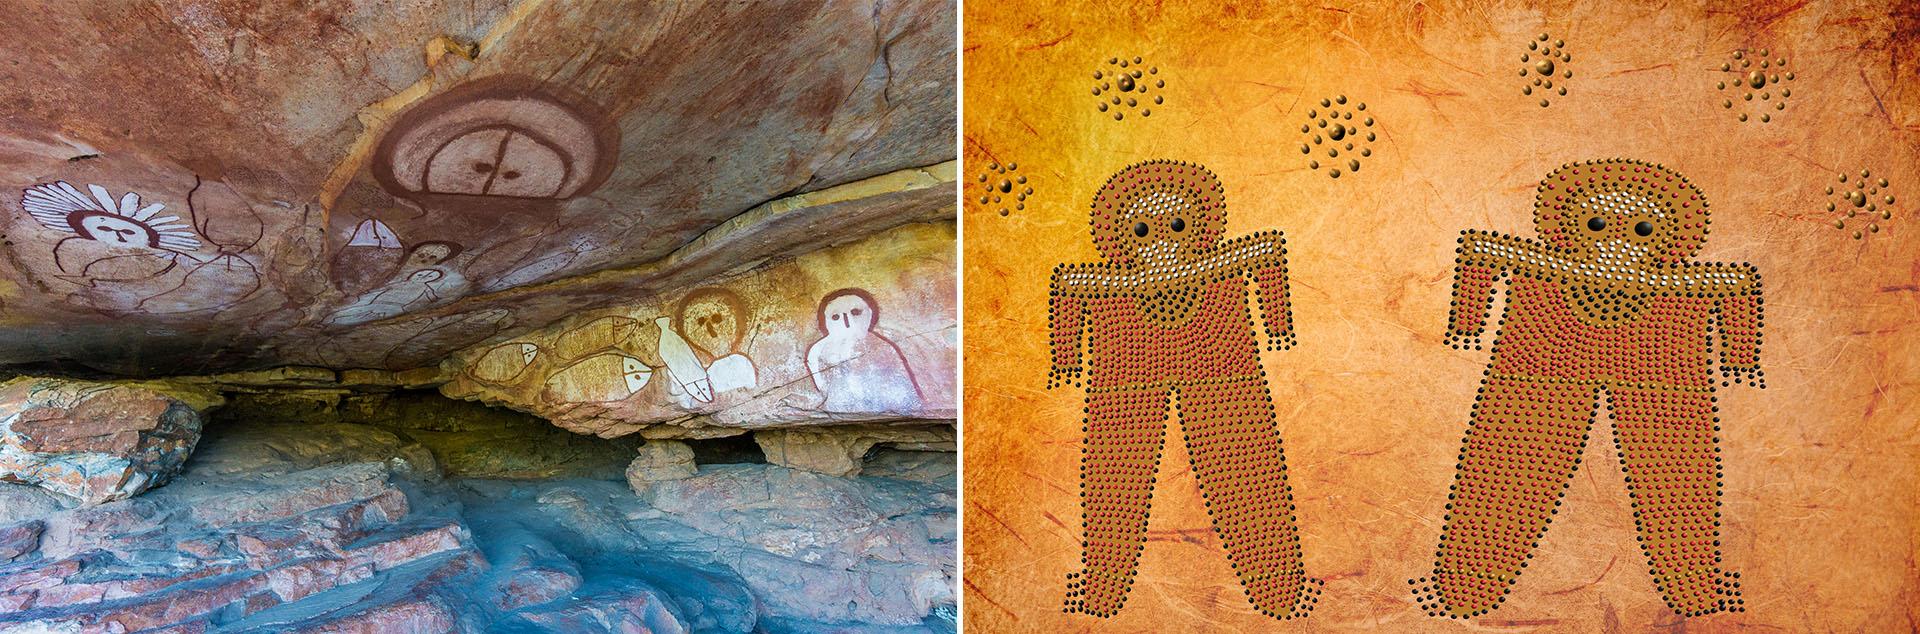 Pinturas sobre los Wandjina en Australia